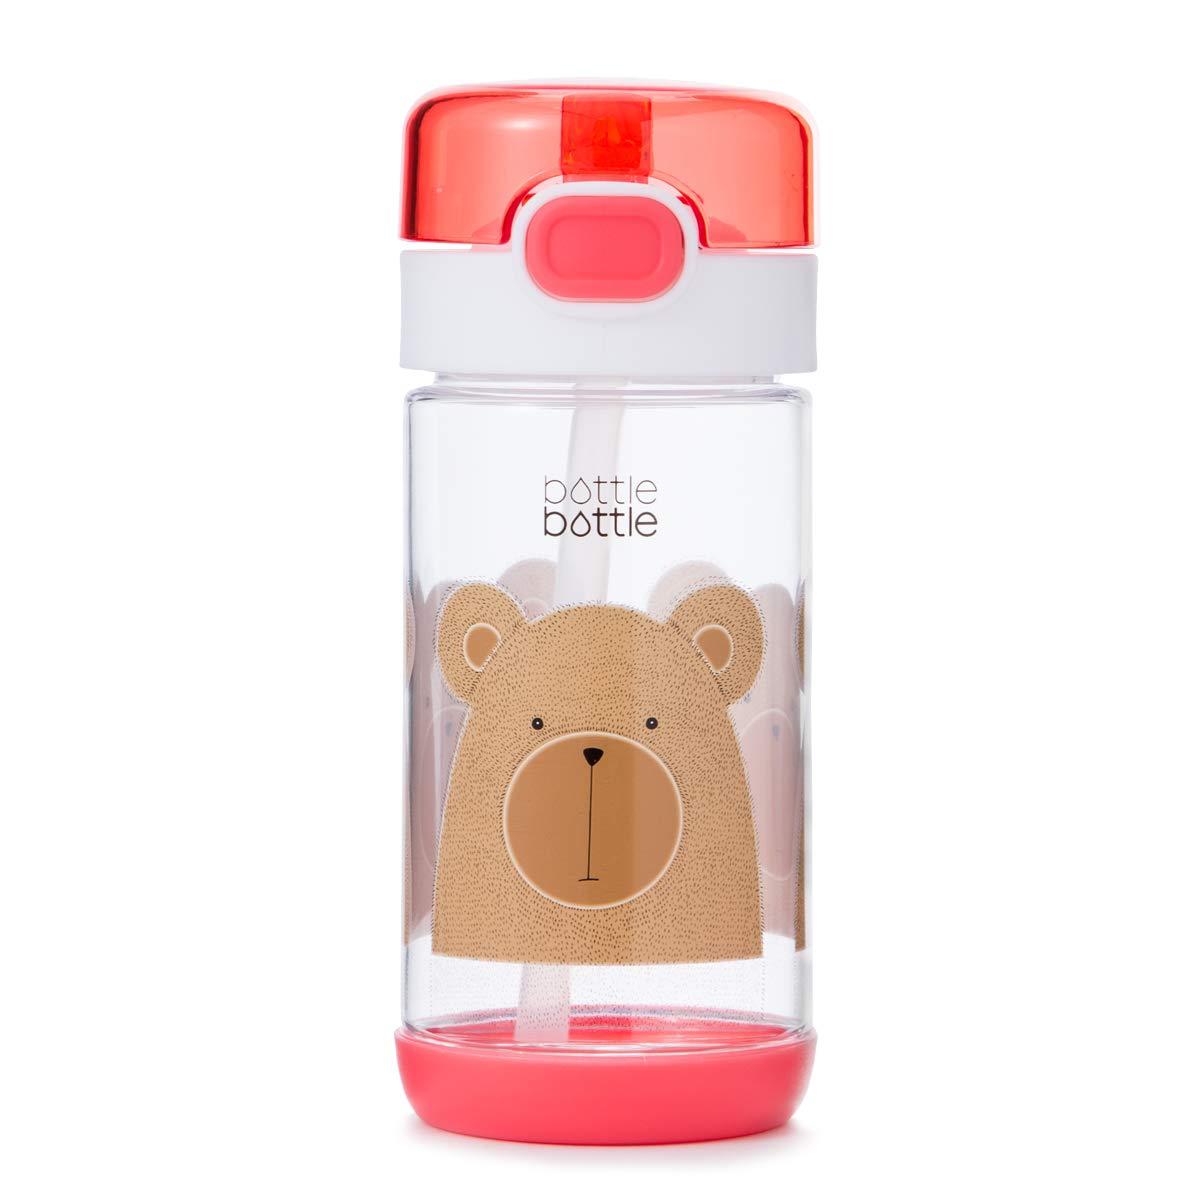 bottlebottle 12オンス真空断熱ステンレススチールKidsウォーターボトルリークプルーフFlip Lid、BPAフリー魔法瓶旅行マグ B07DL448R8 Pink with Bear